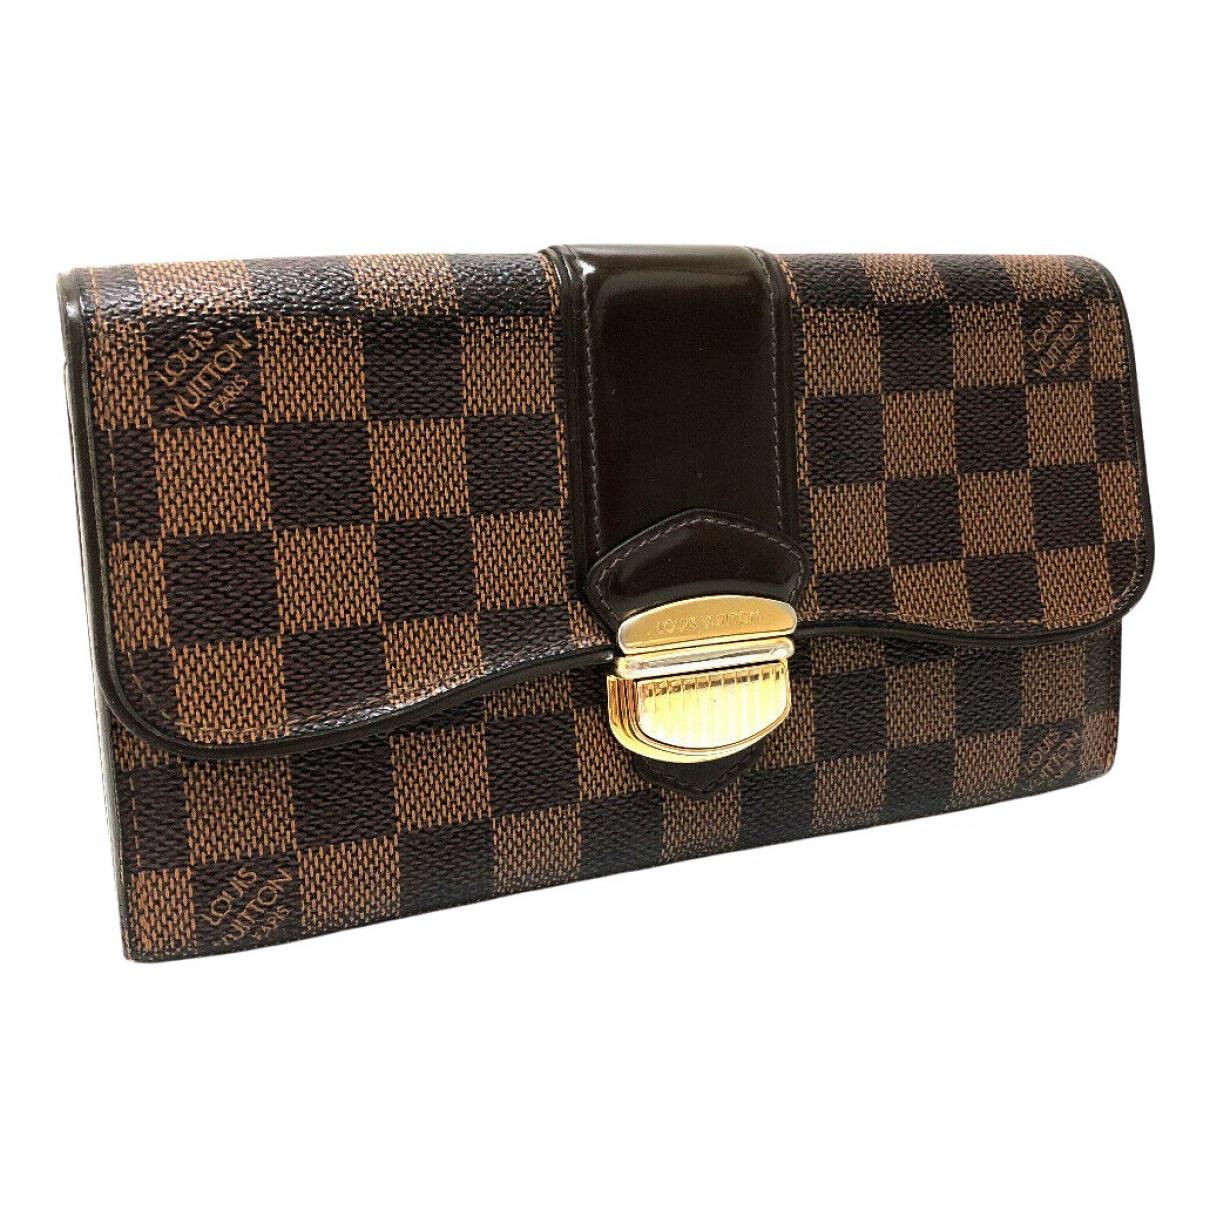 Louis Vuitton Sistina Portemonnaie in  Braun Leinen